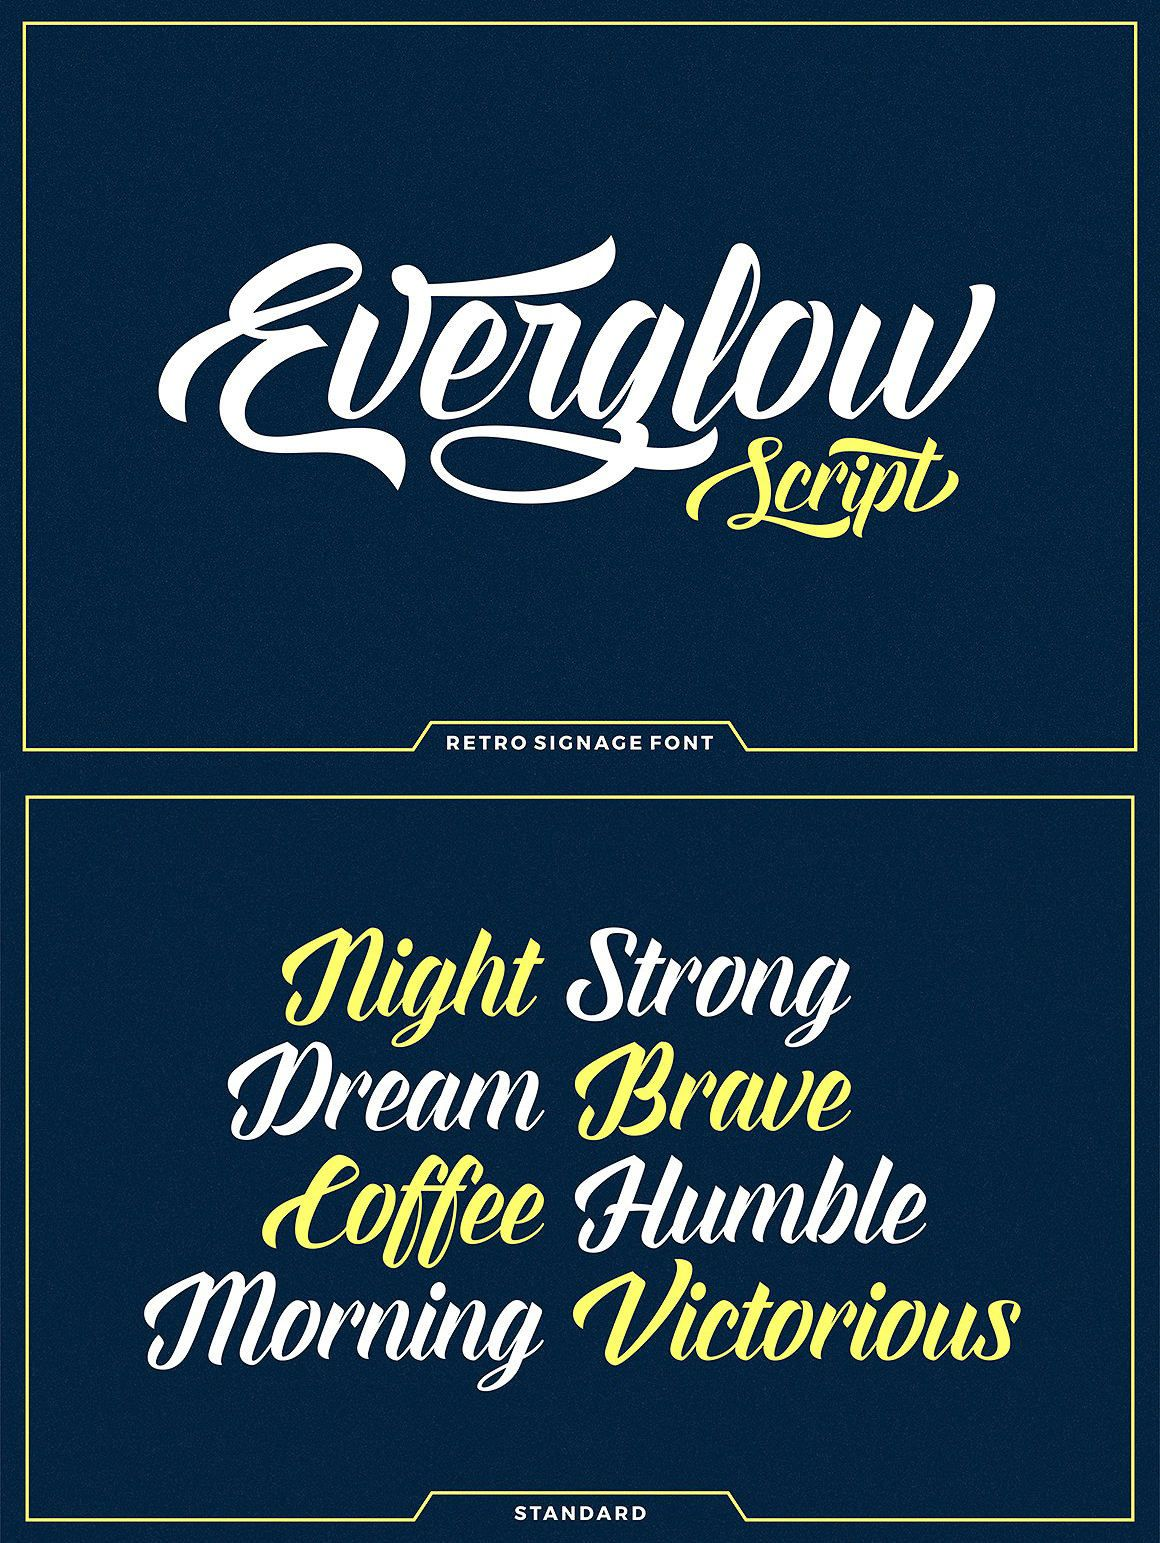 Everglow Script, Retro Font, Calligraphy Font, Brush Font